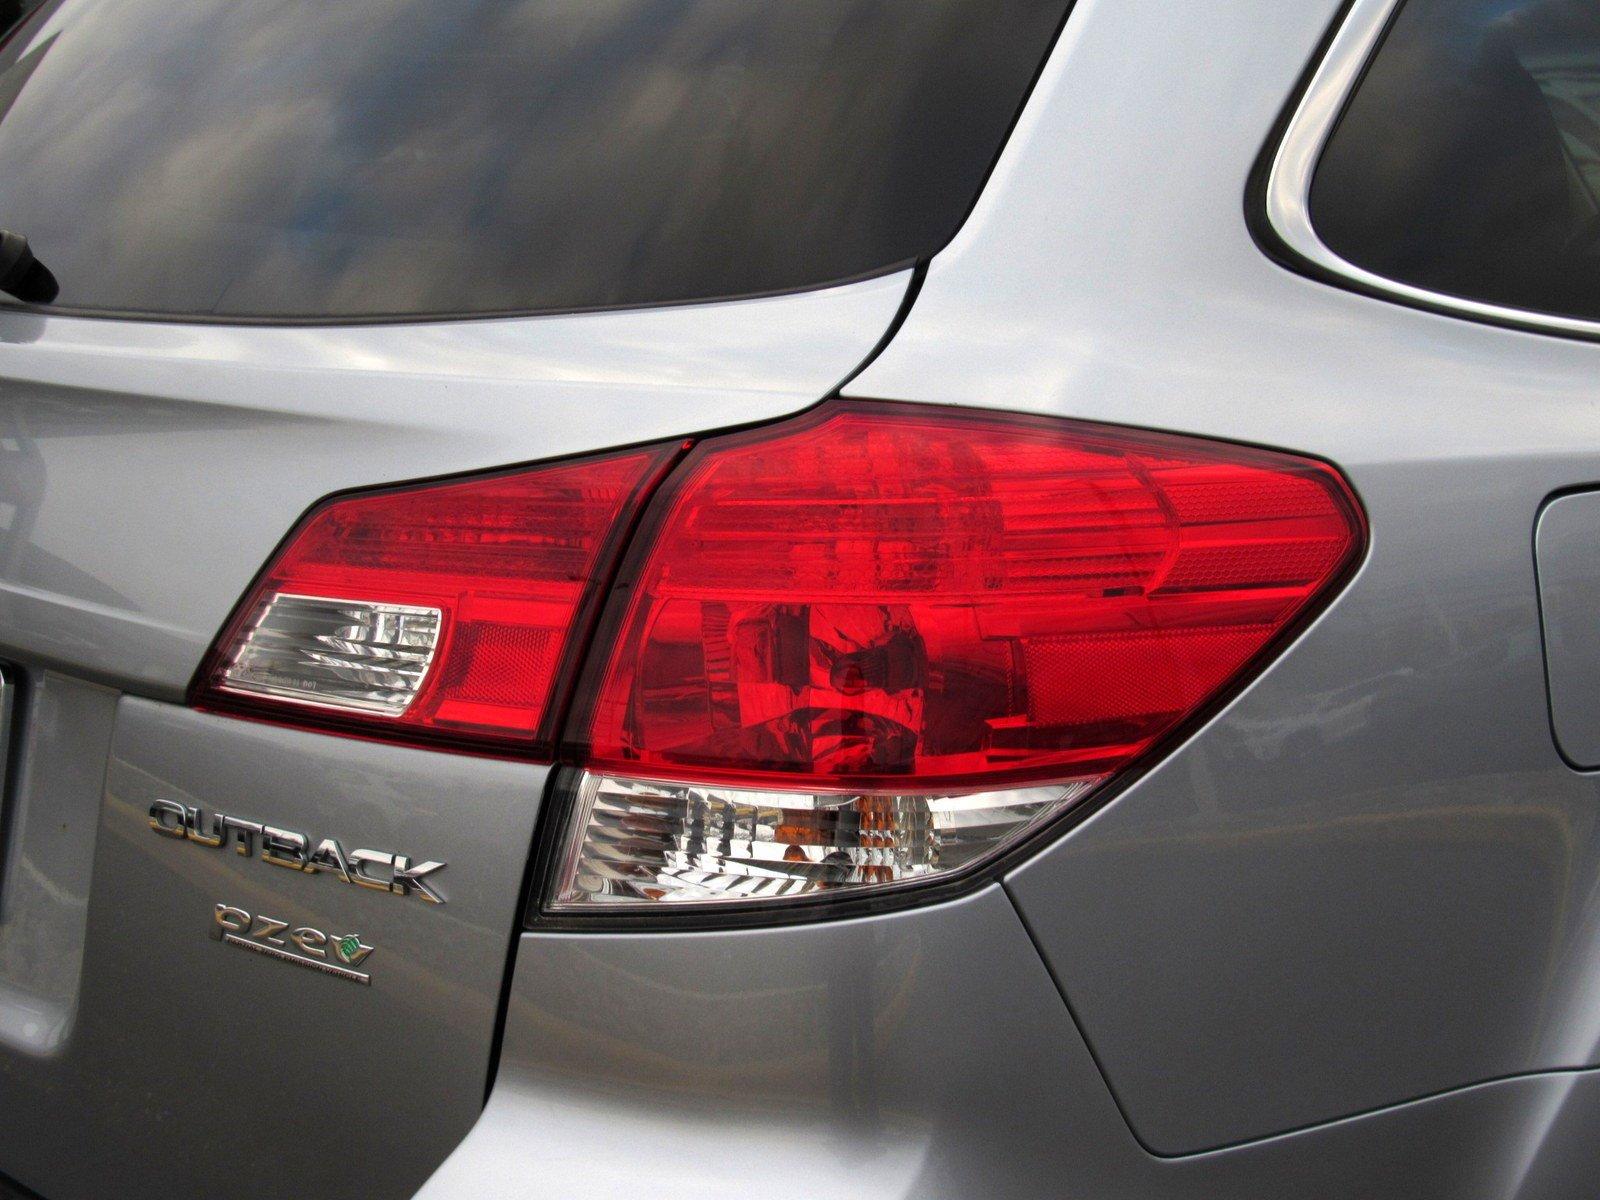 Pre-Owned 2012 Subaru Outback 2.5i Limited